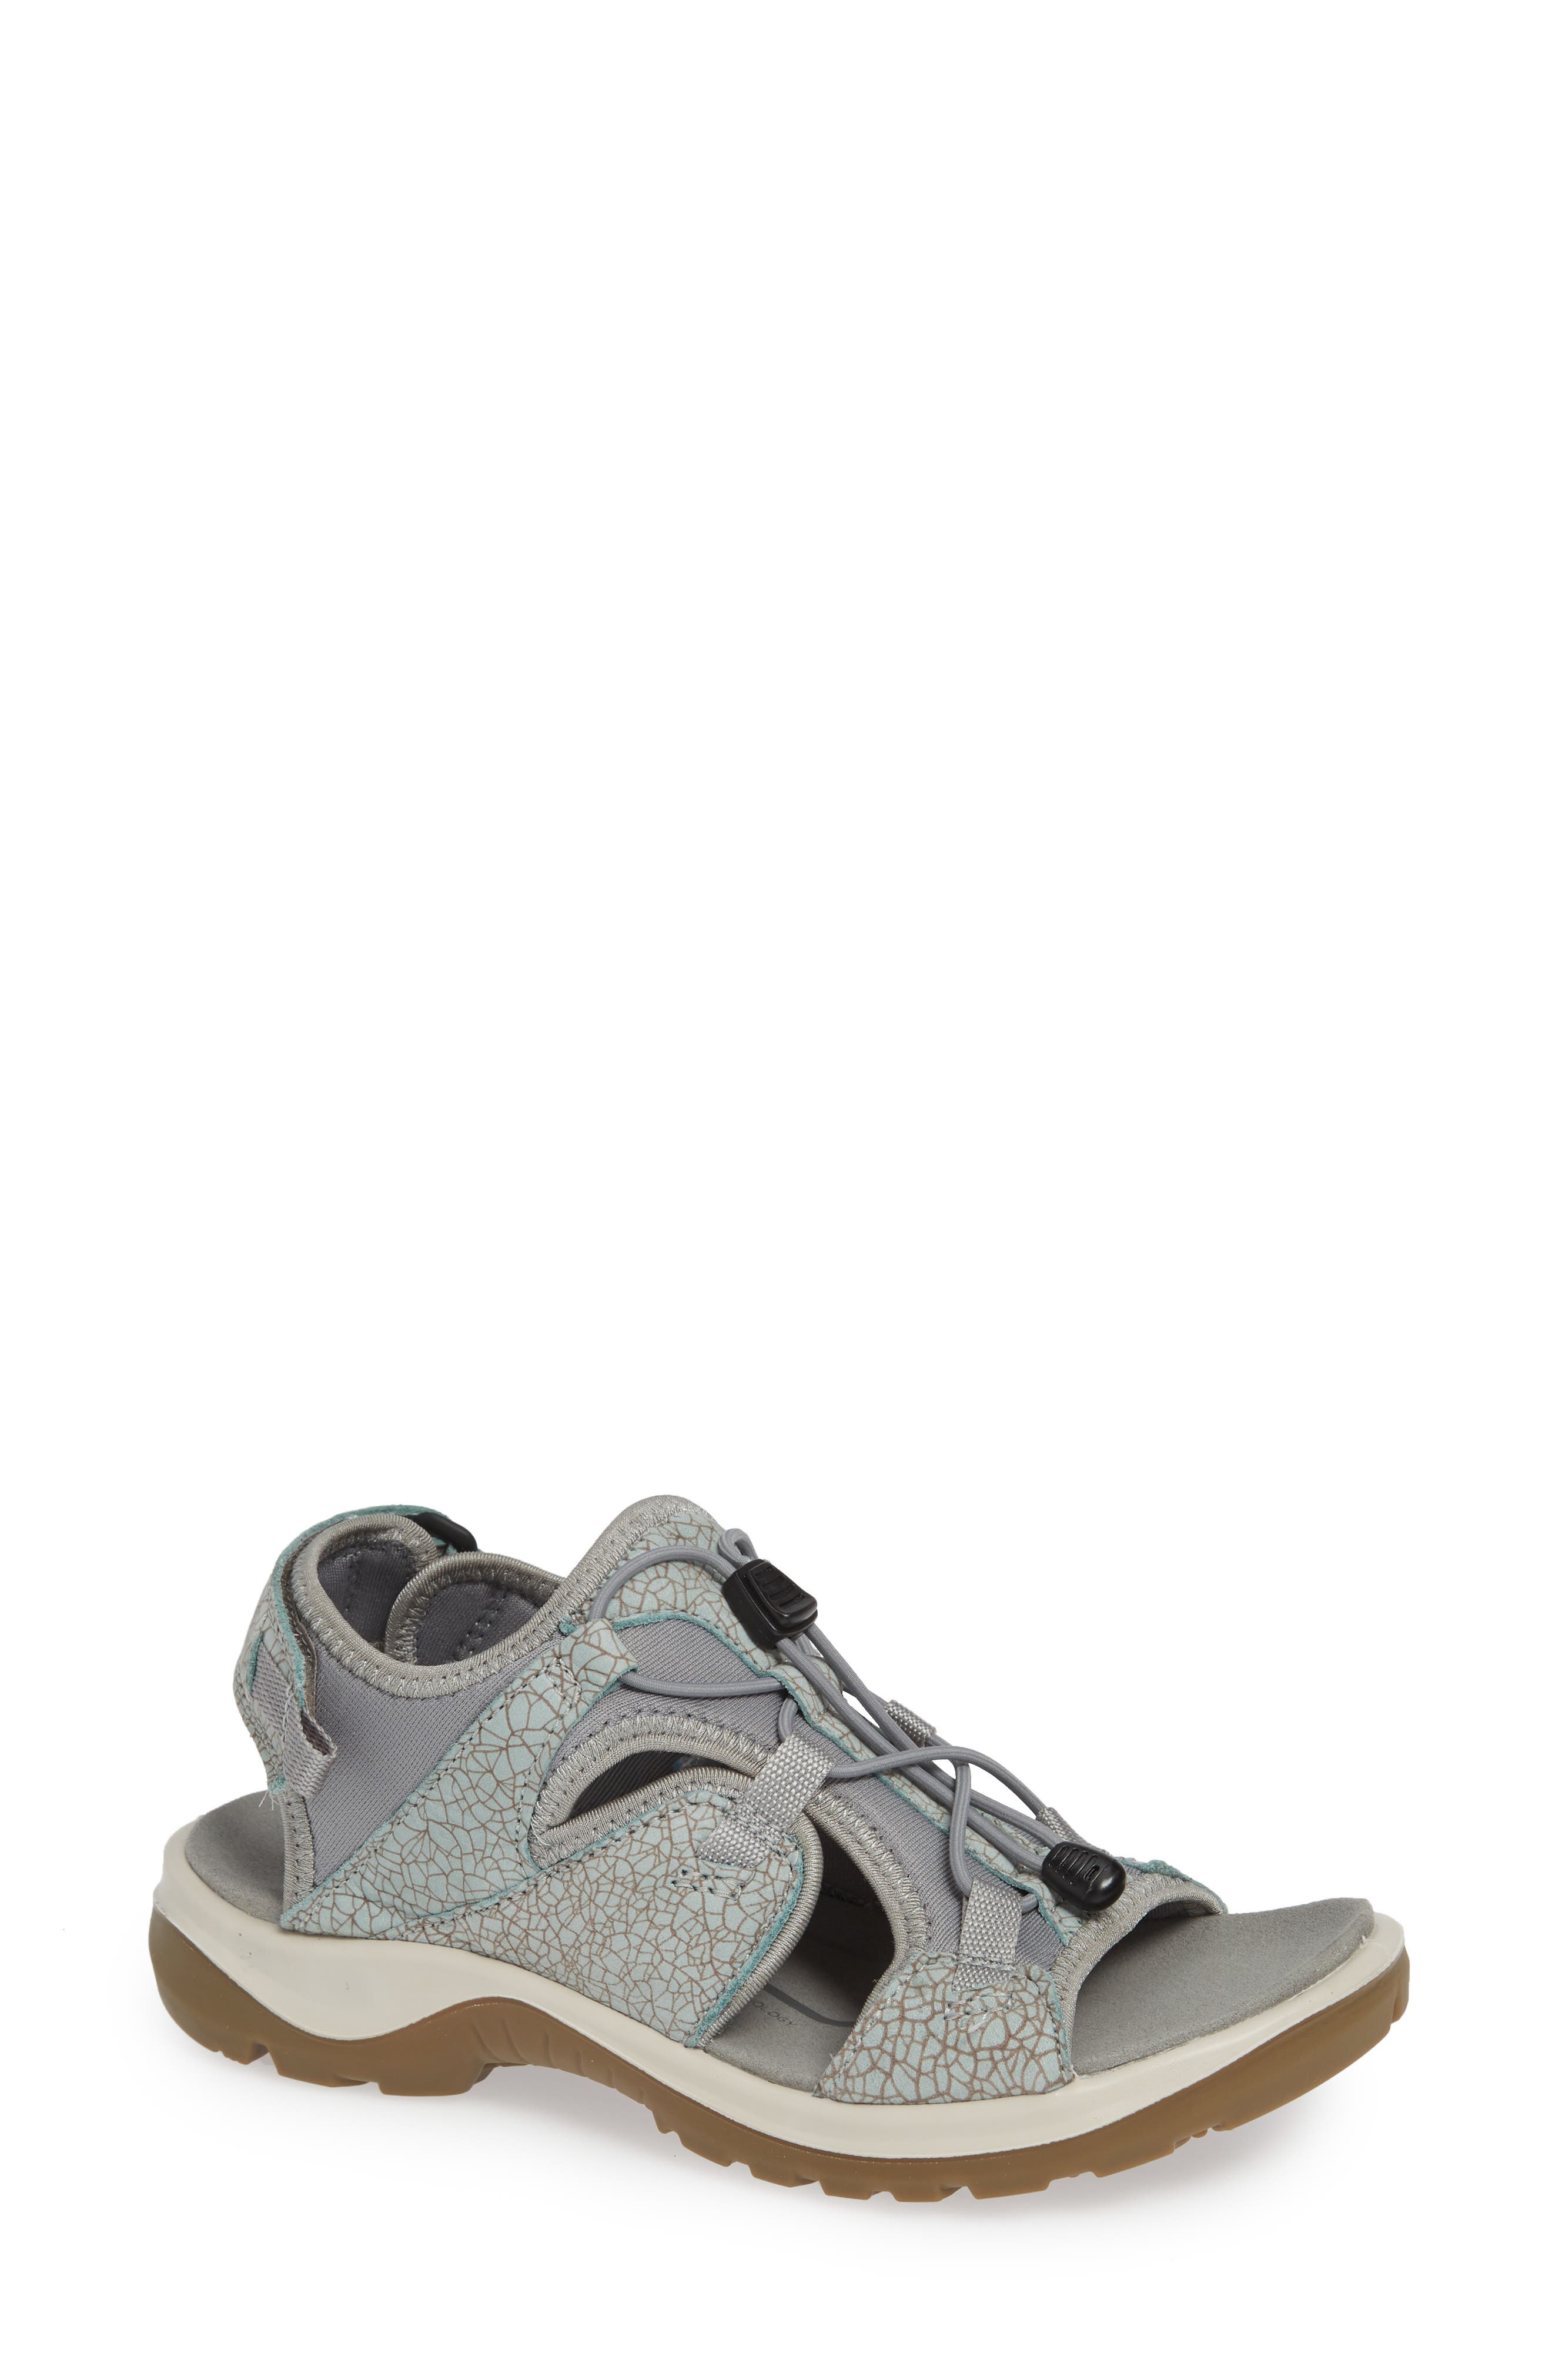 Ecco Off-Road Sandal, Blue